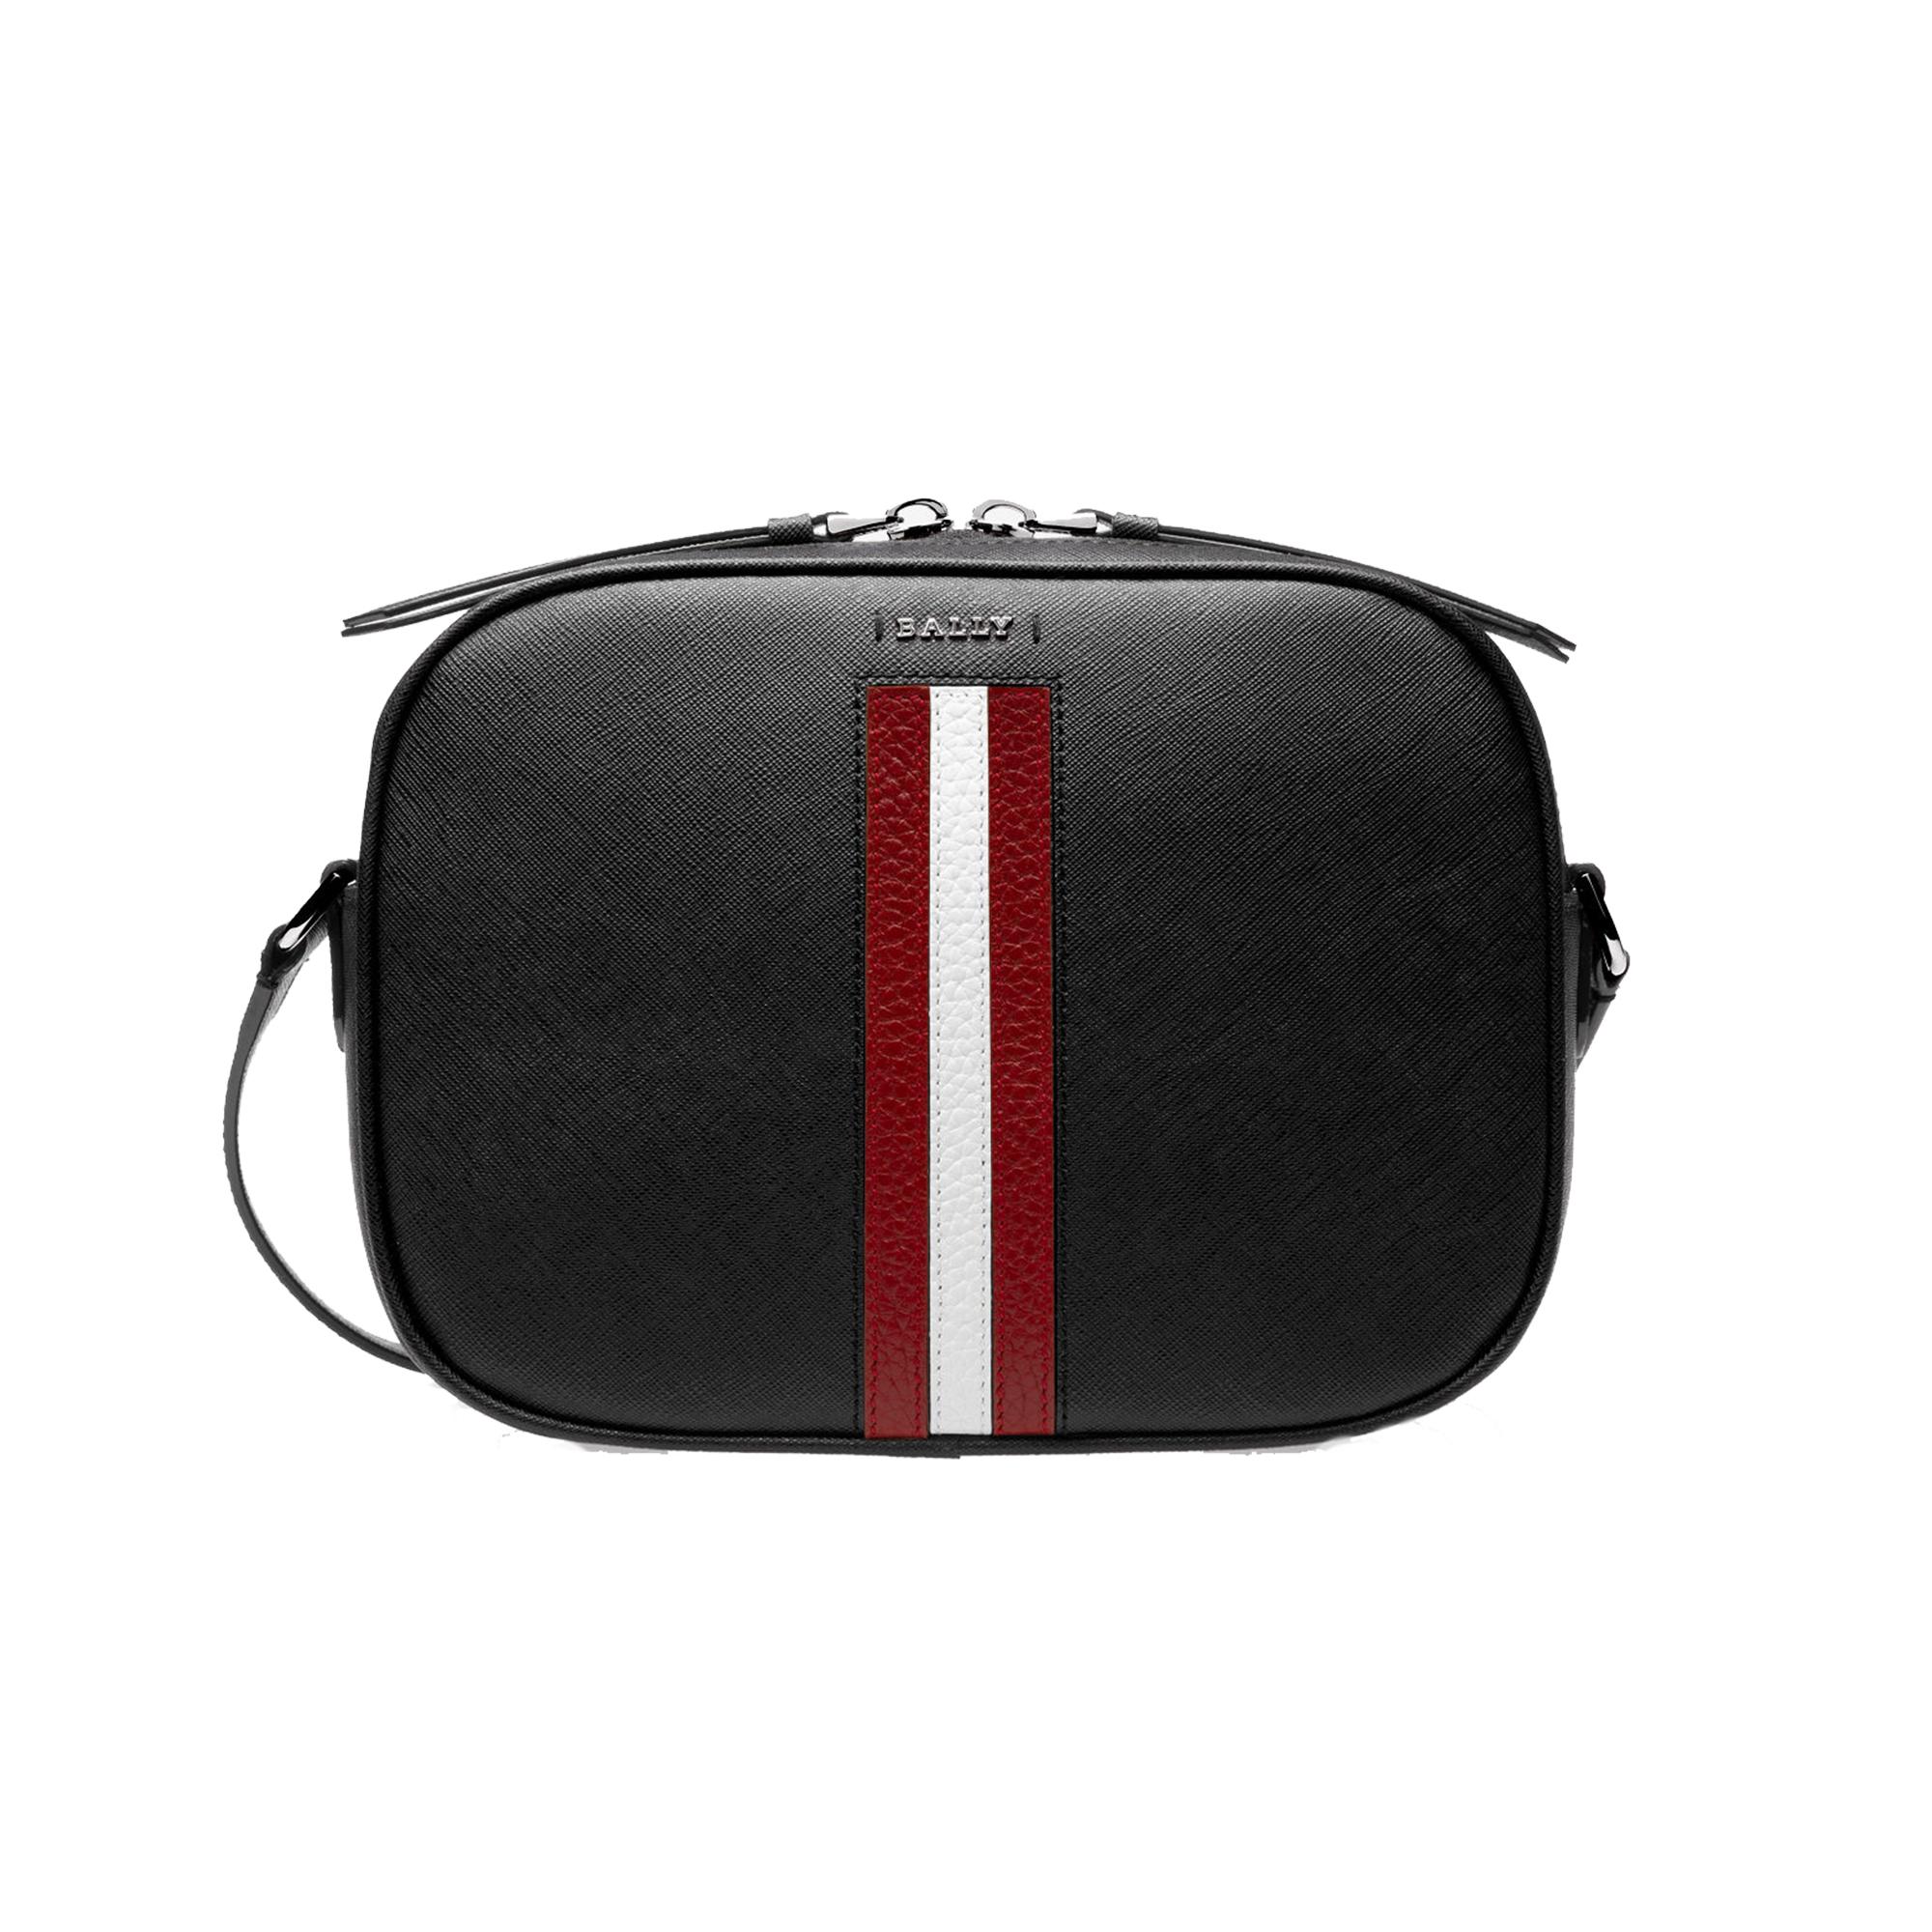 Bally Sastrid Saffiano Leather Minibag